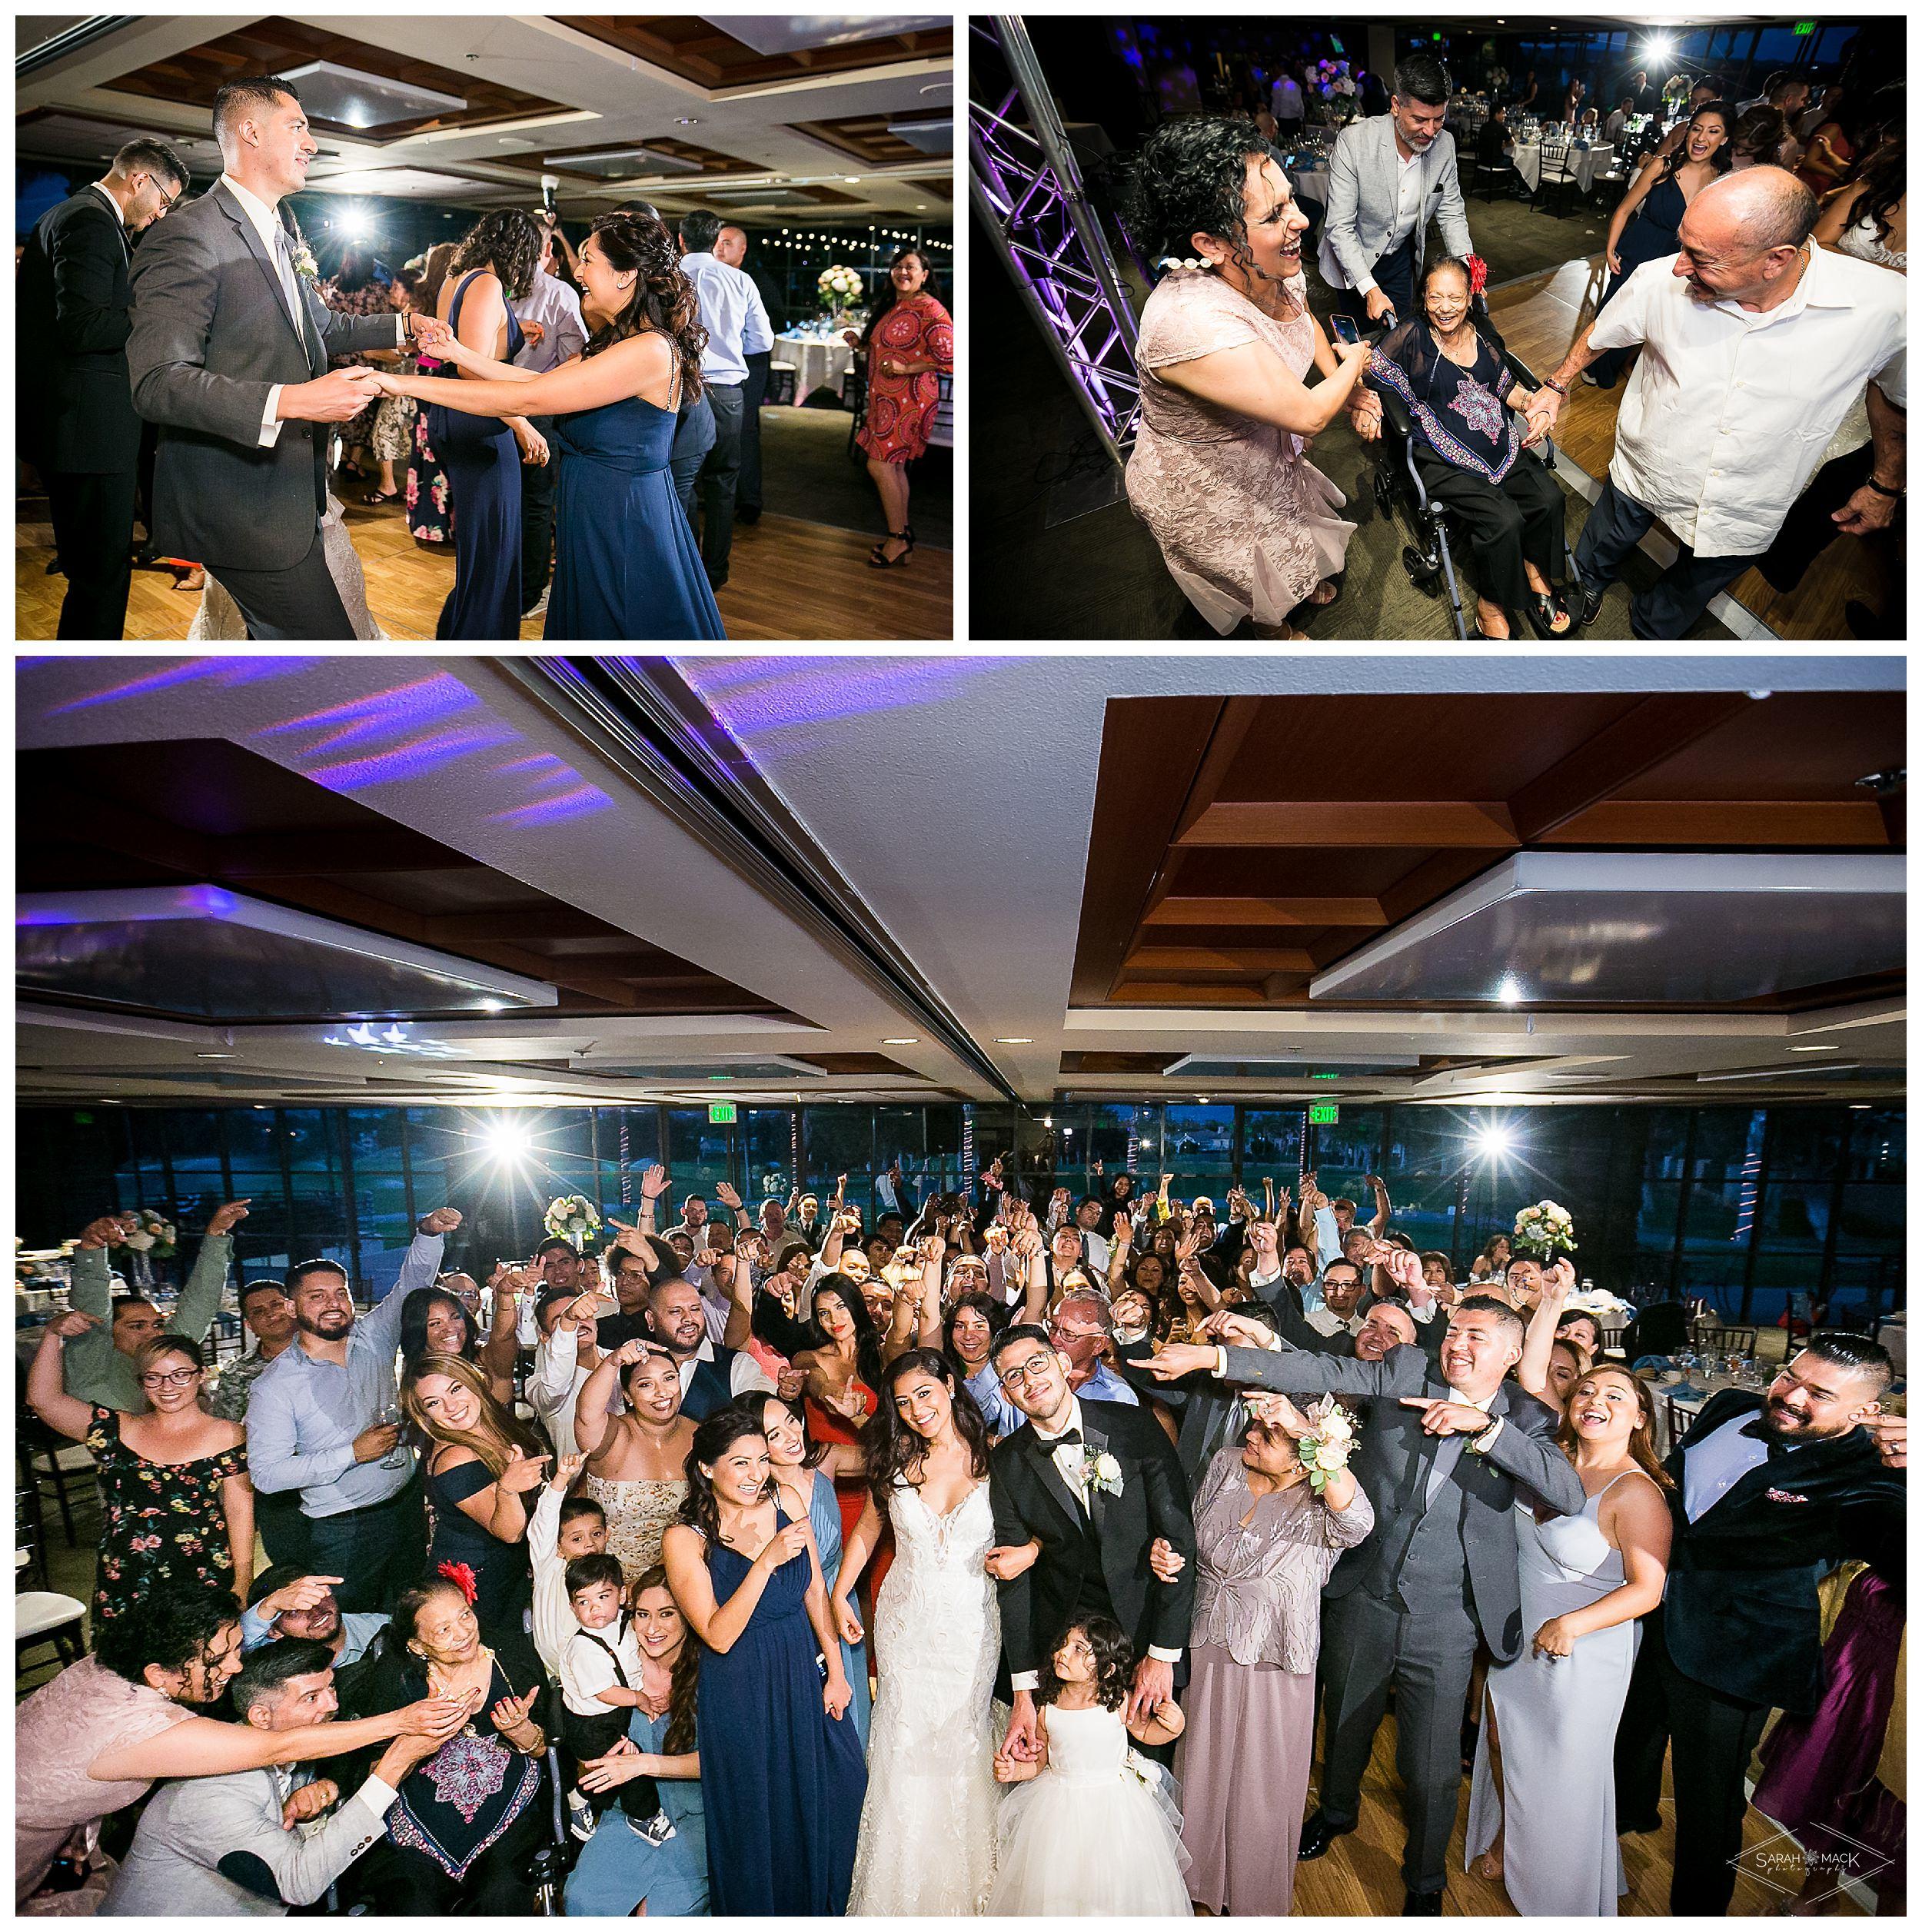 IA-Alta-Vista-Country-Club-Yorba-Linda-Wedding-Photography 628.jpg